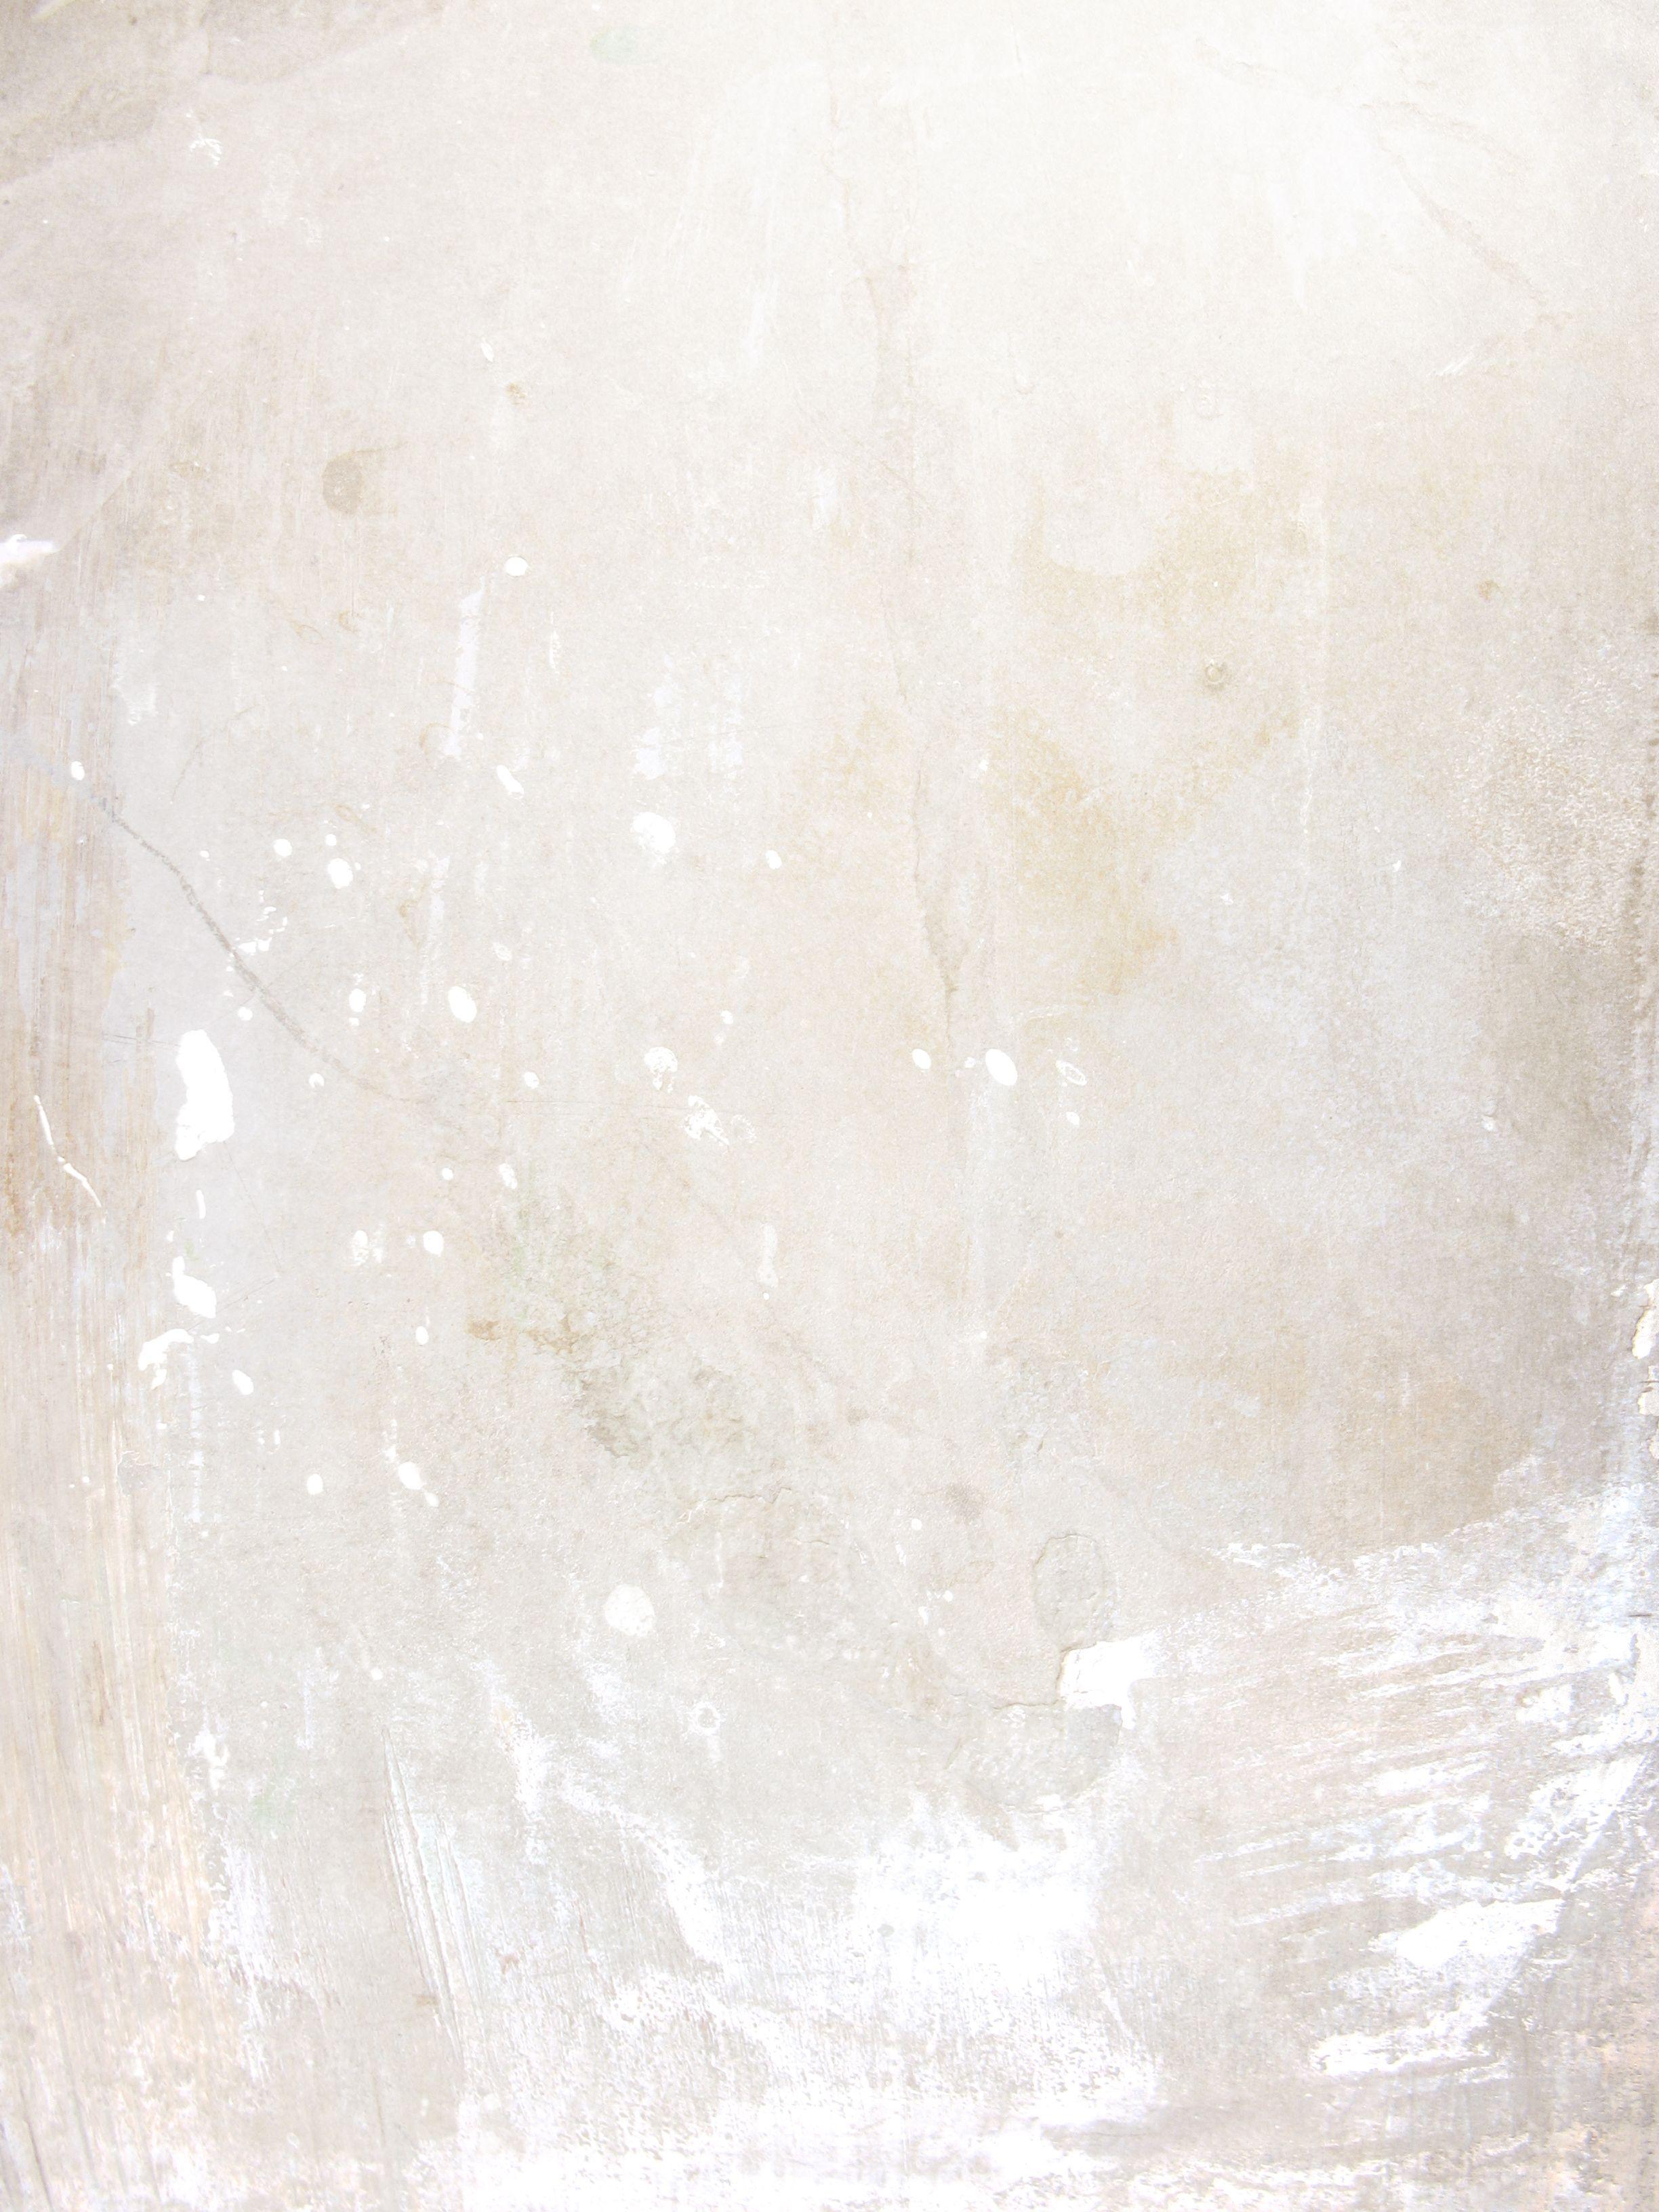 Free subtle light grunge texture texture l t textures for Free white texture